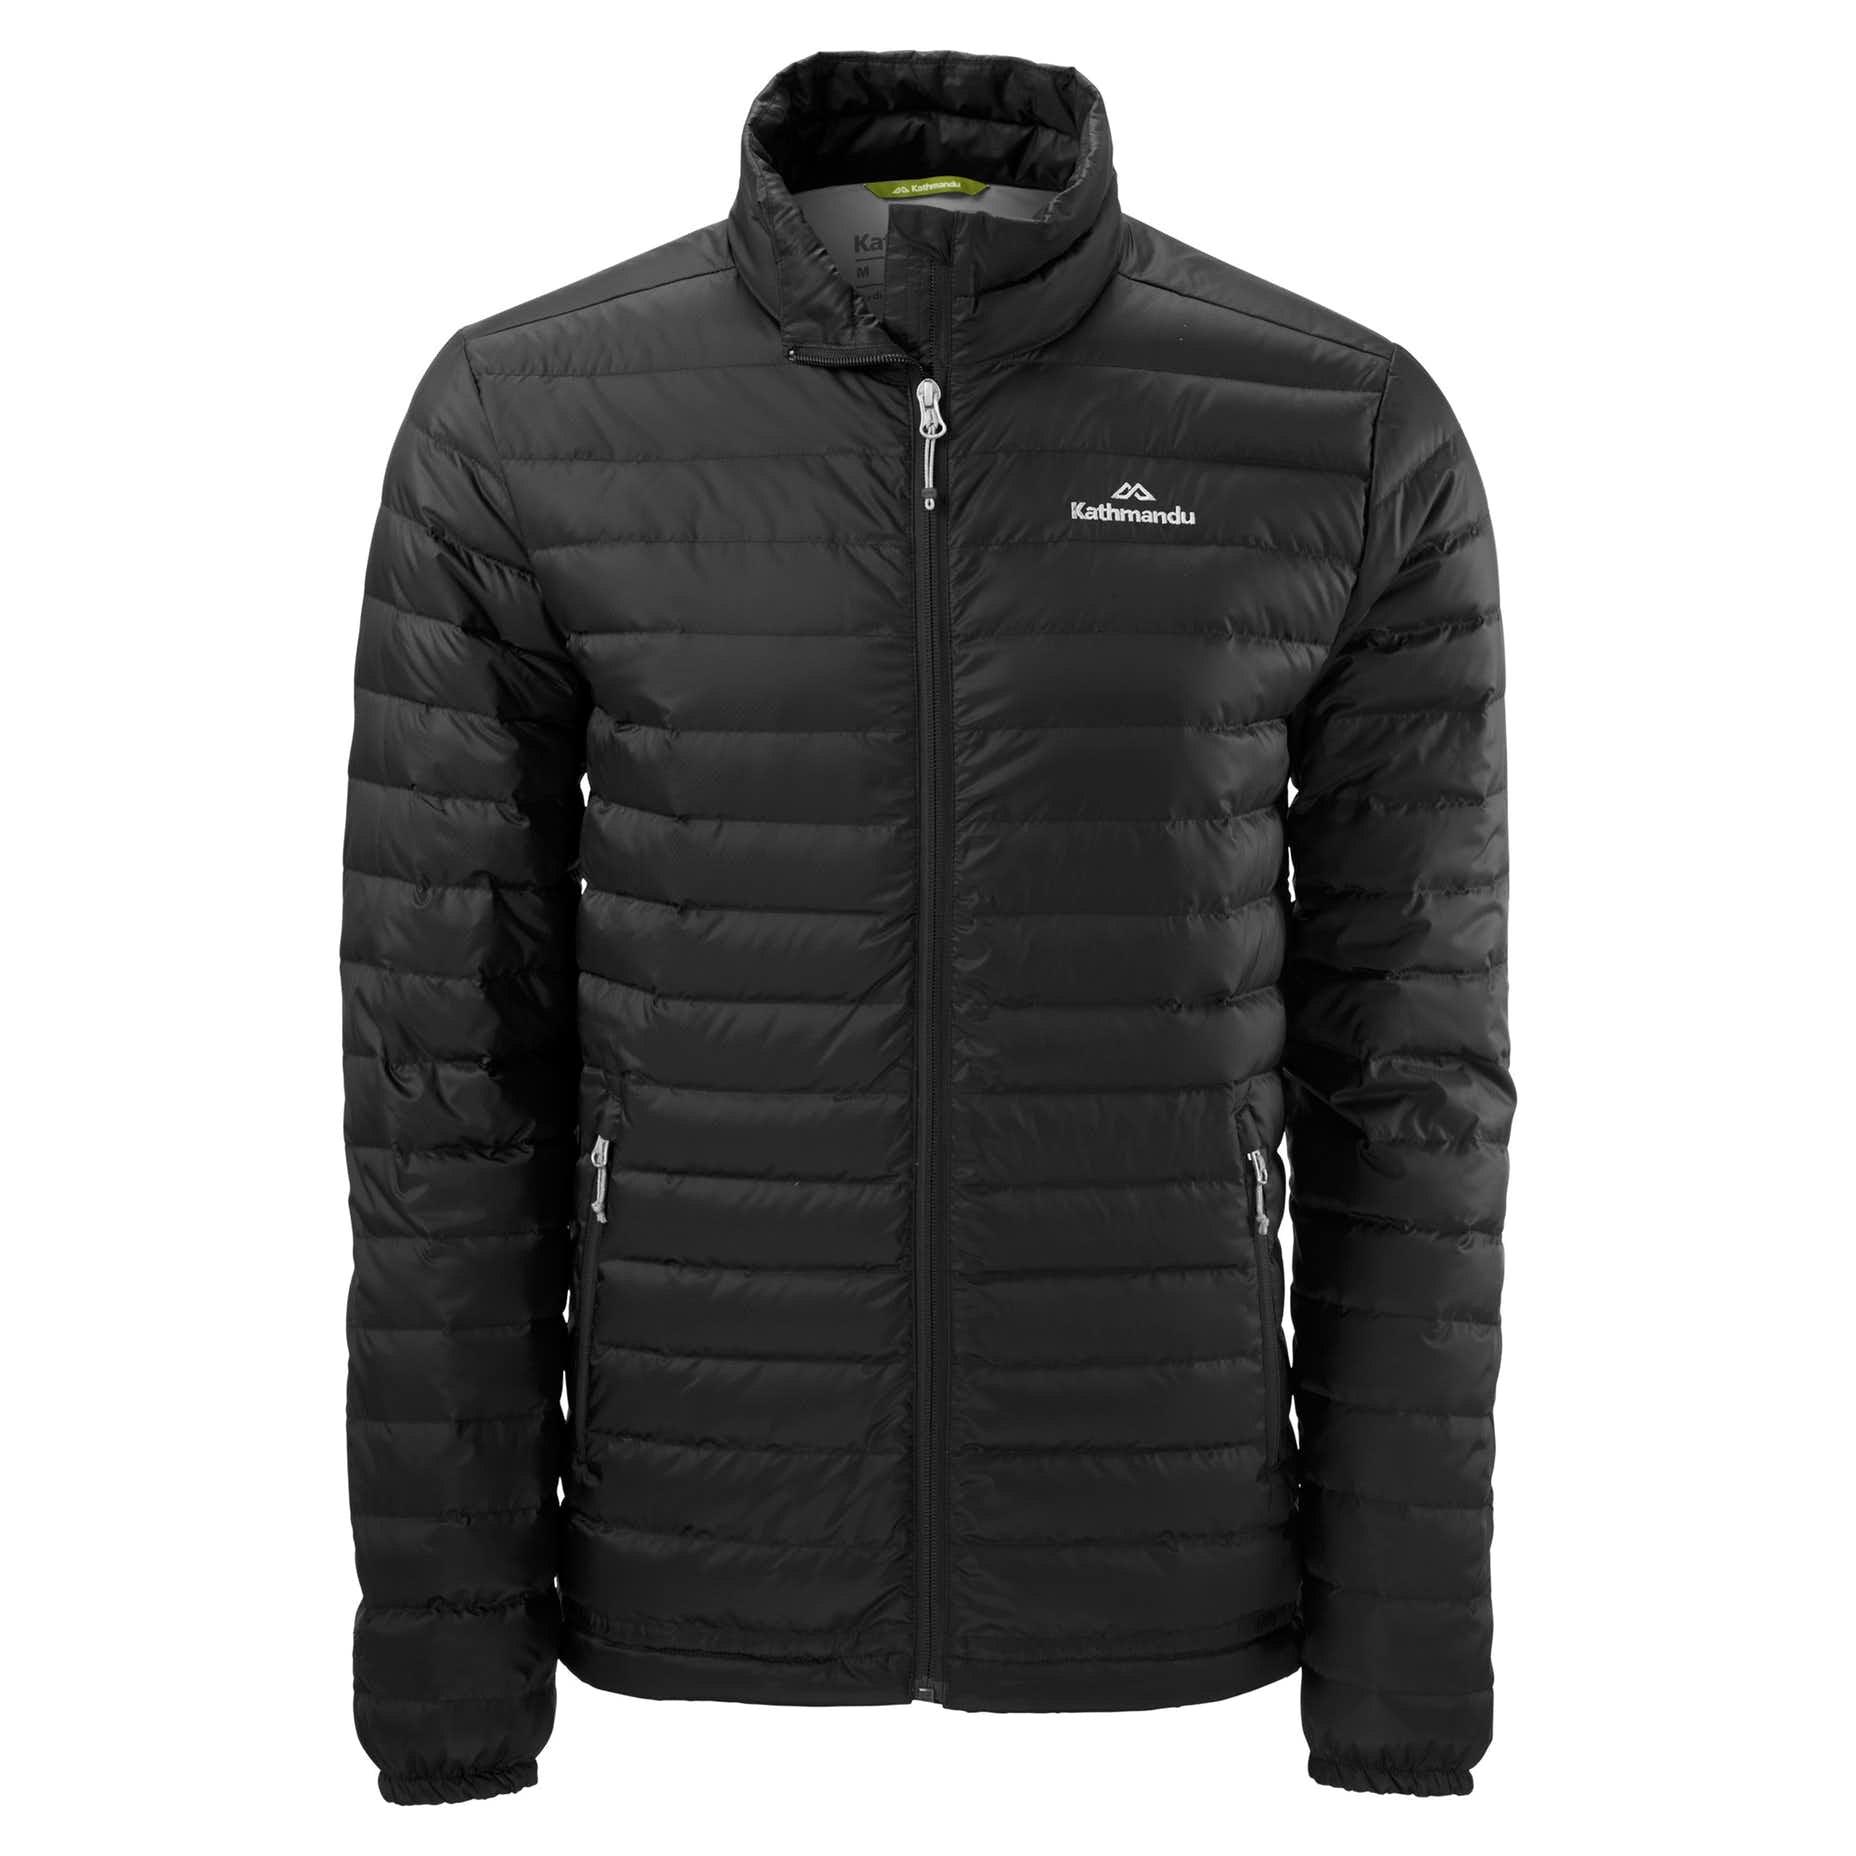 NEW-Kathmandu-Heli-Men-039-s-Lightweight-Duck-Down-Coat-Warm-Puffer-Jacket-v2 thumbnail 9